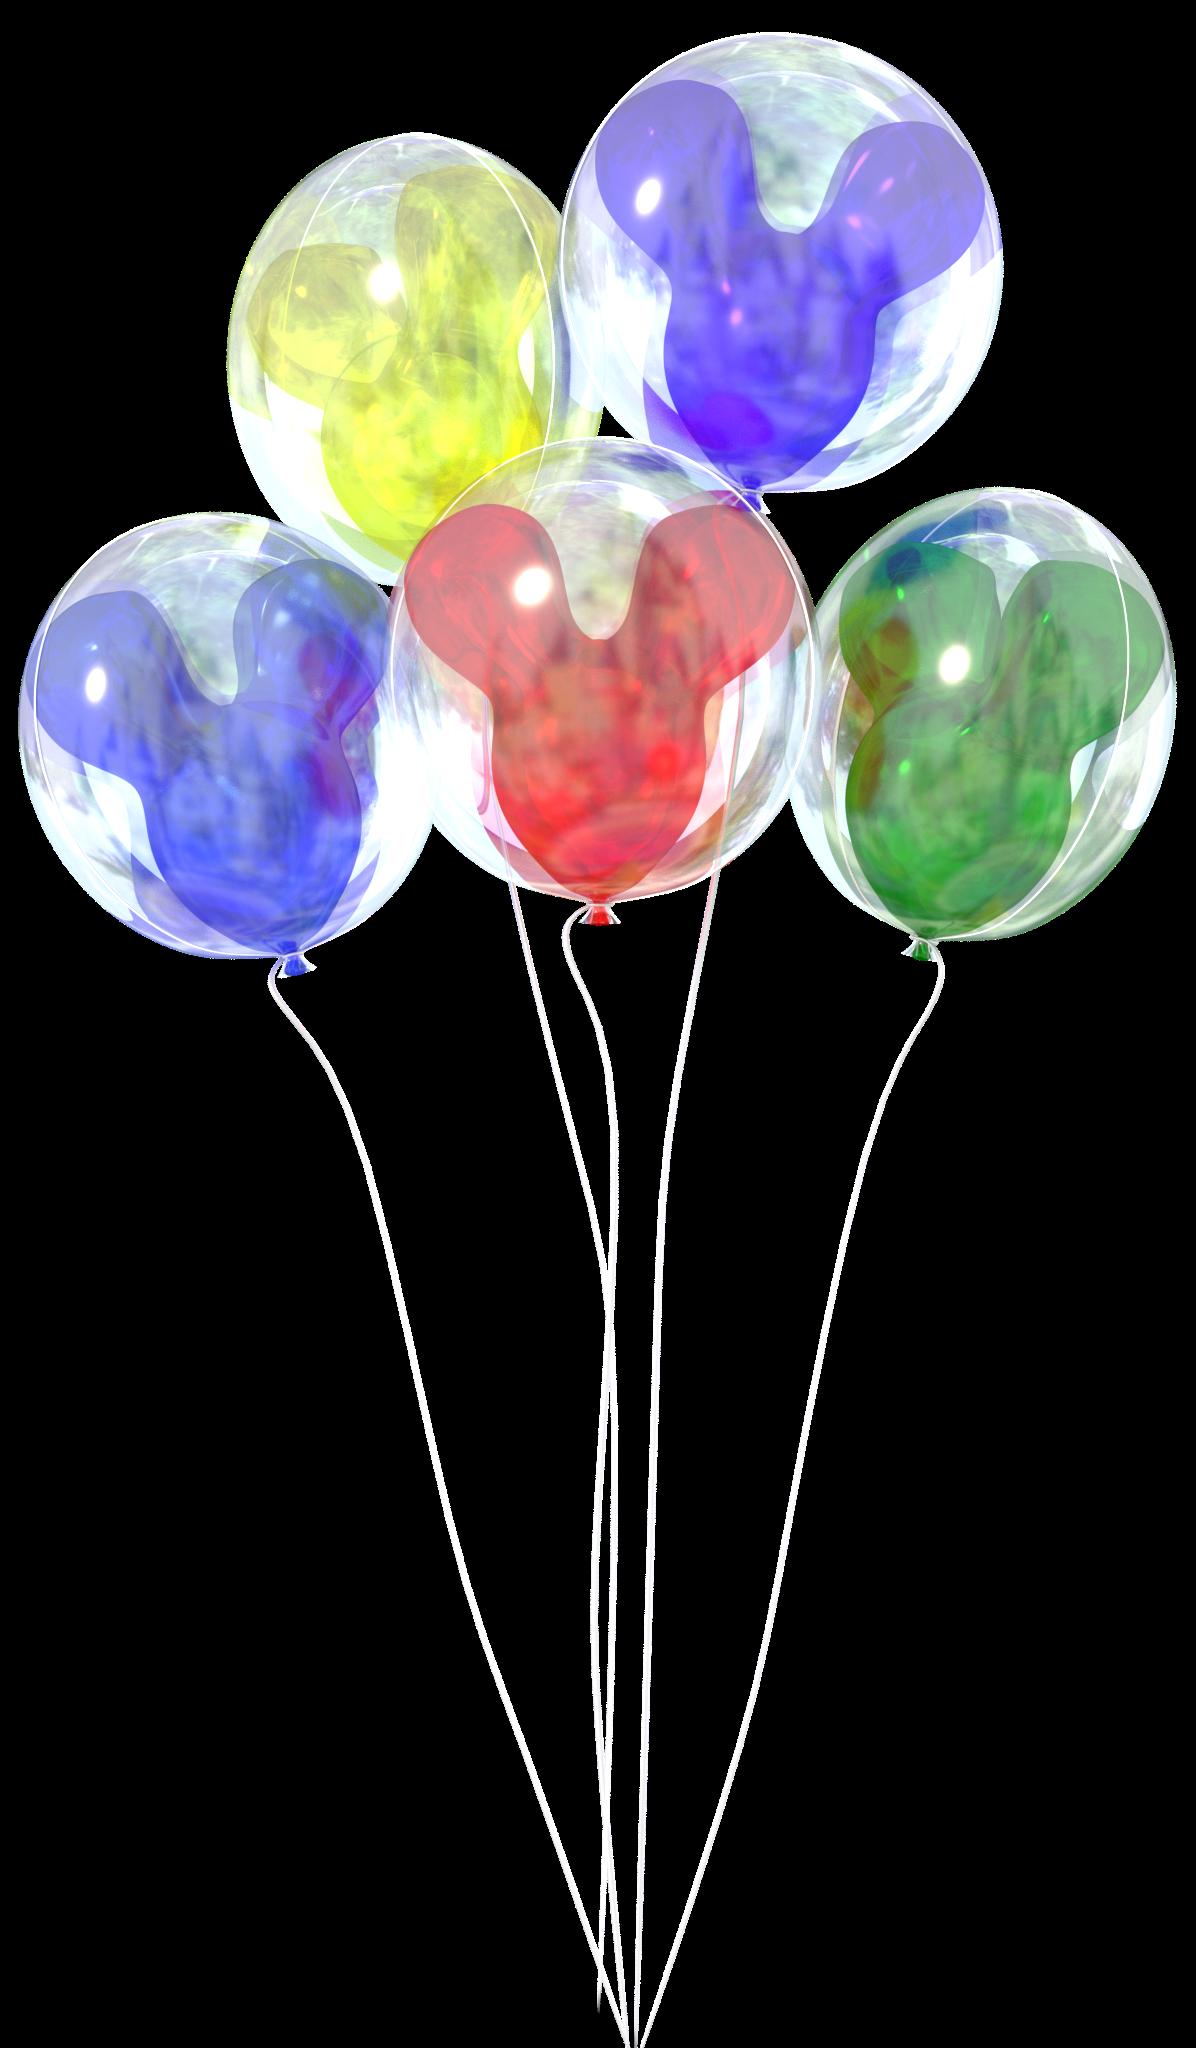 Walt Disney World Balloons Png & Free Walt Disney World Balloons.png.